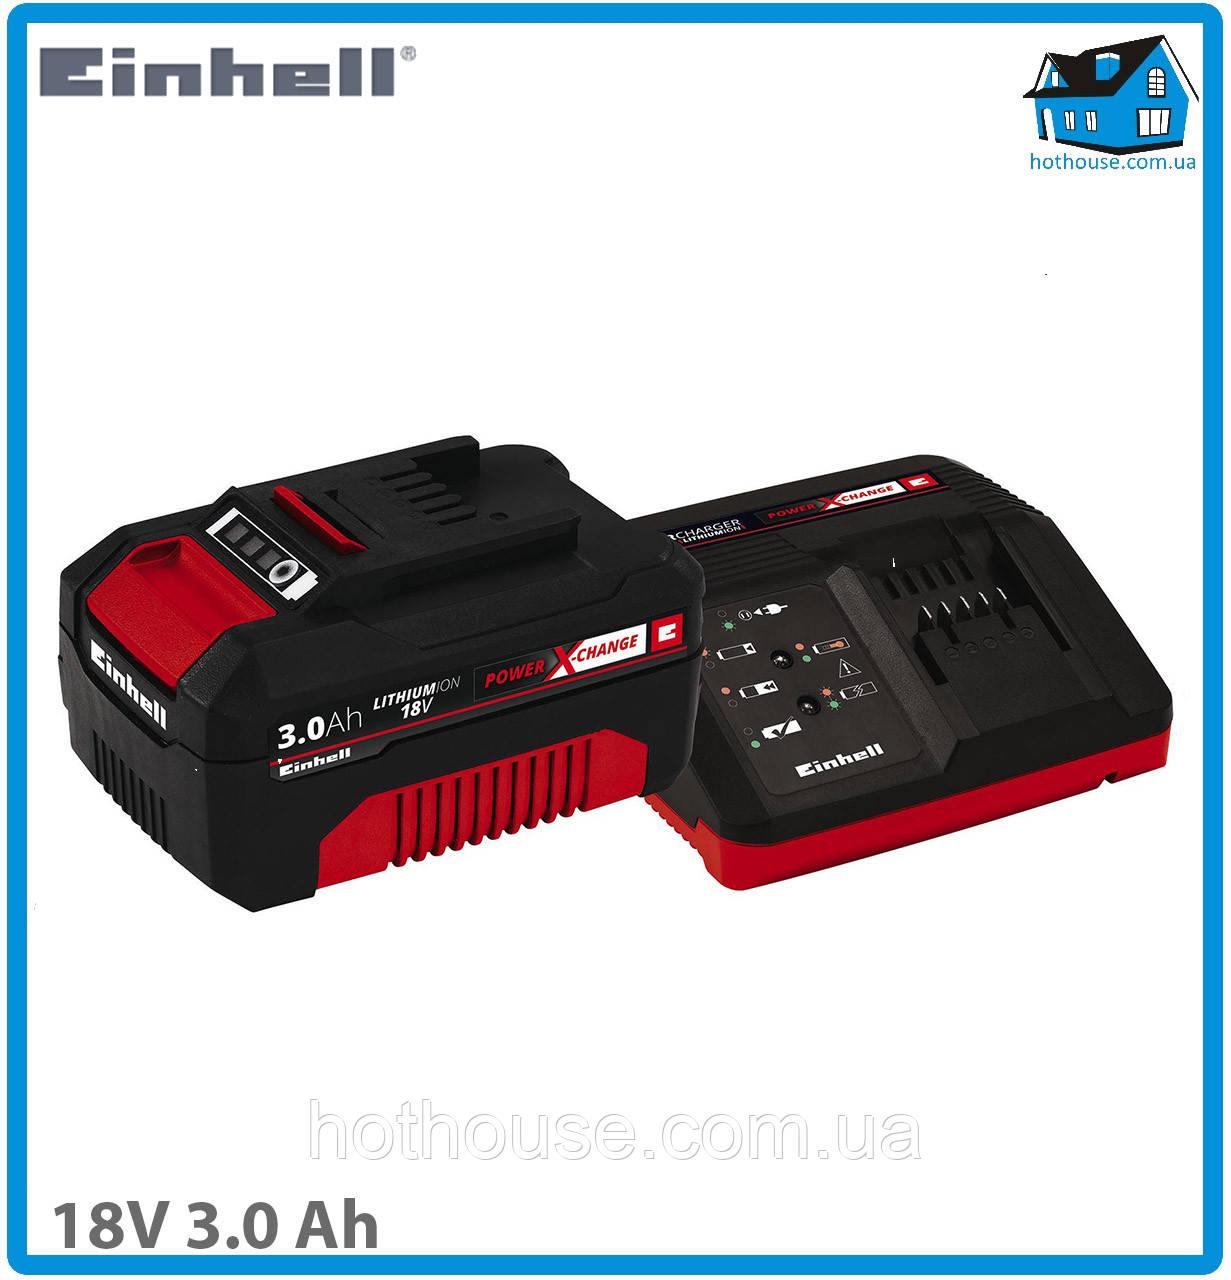 Энергоблок Einhell 18V 3.0 Ah St. Kit